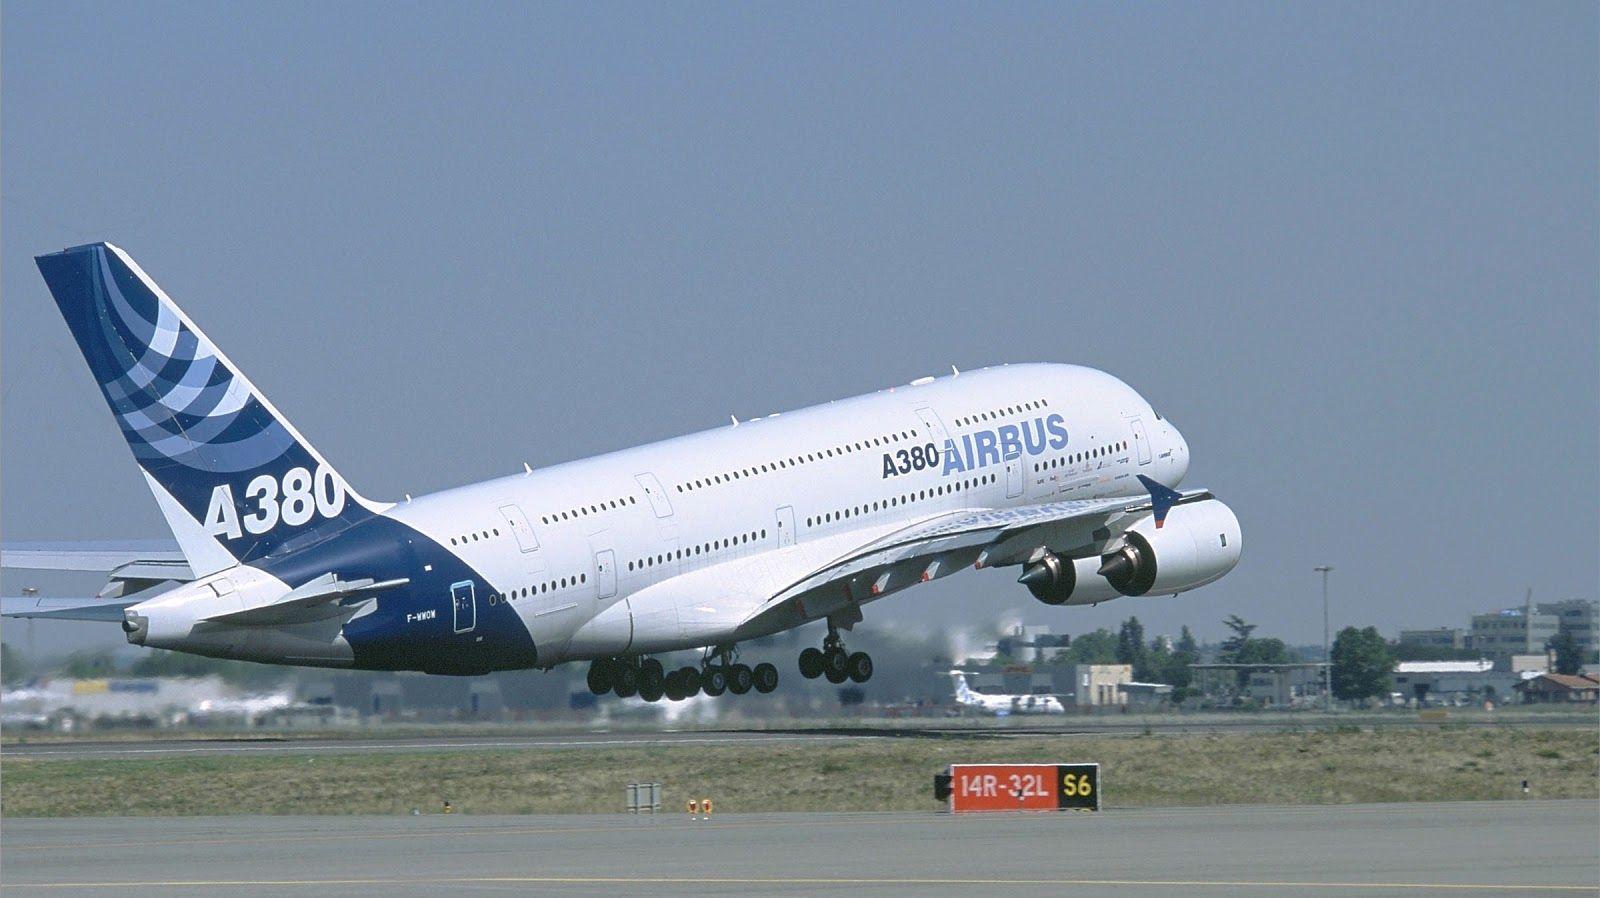 A380 Take Off Wallpaper WallpaperSafari   Wallpapers   Pinterest   Airbus  A380